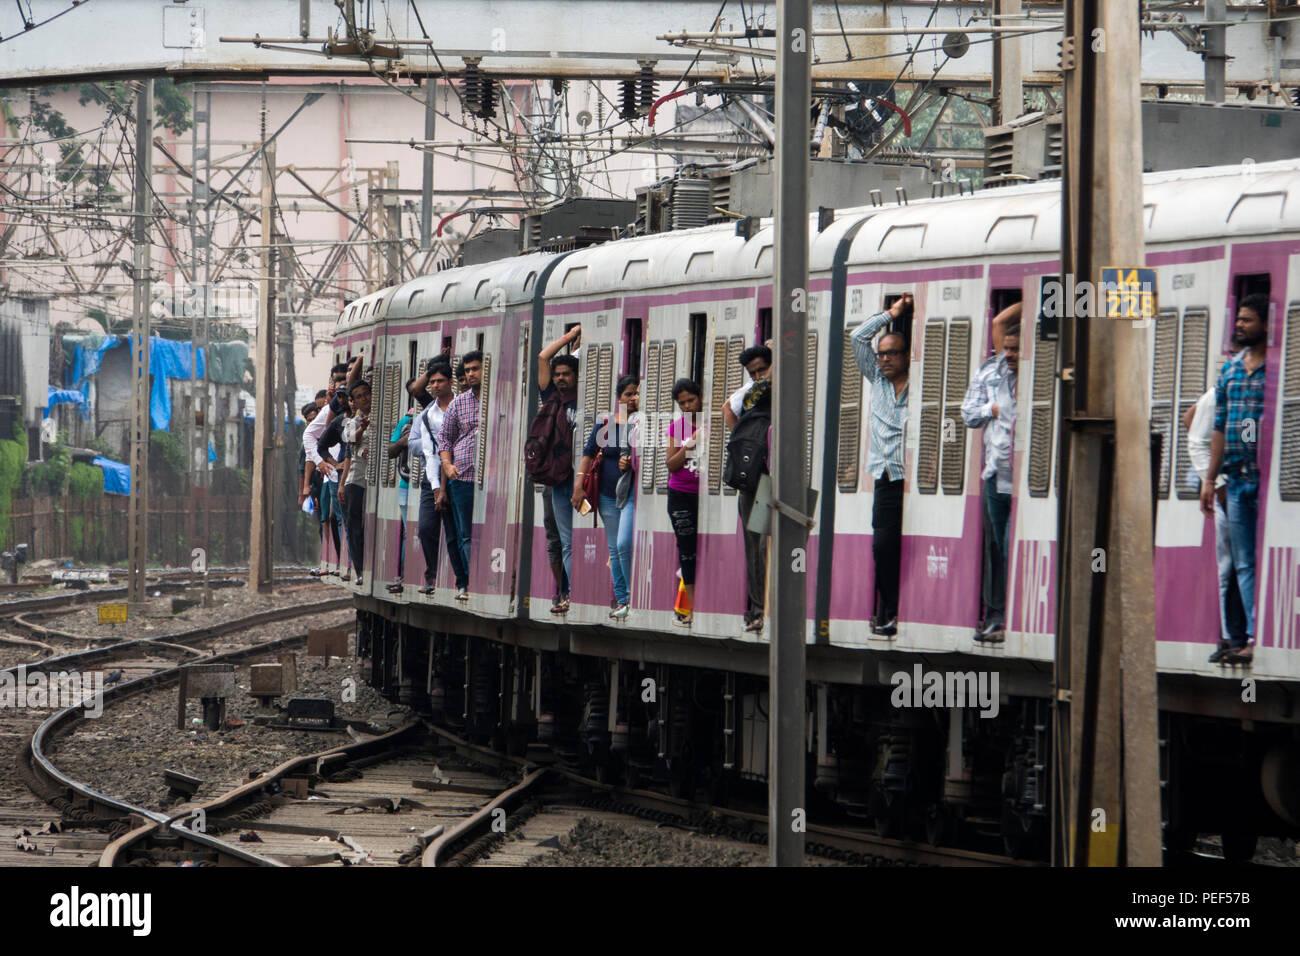 Passengers hanging out of trains door on a Mumbai Suburban Railway train arriving at Bandra station in Mumbai, India - Stock Image